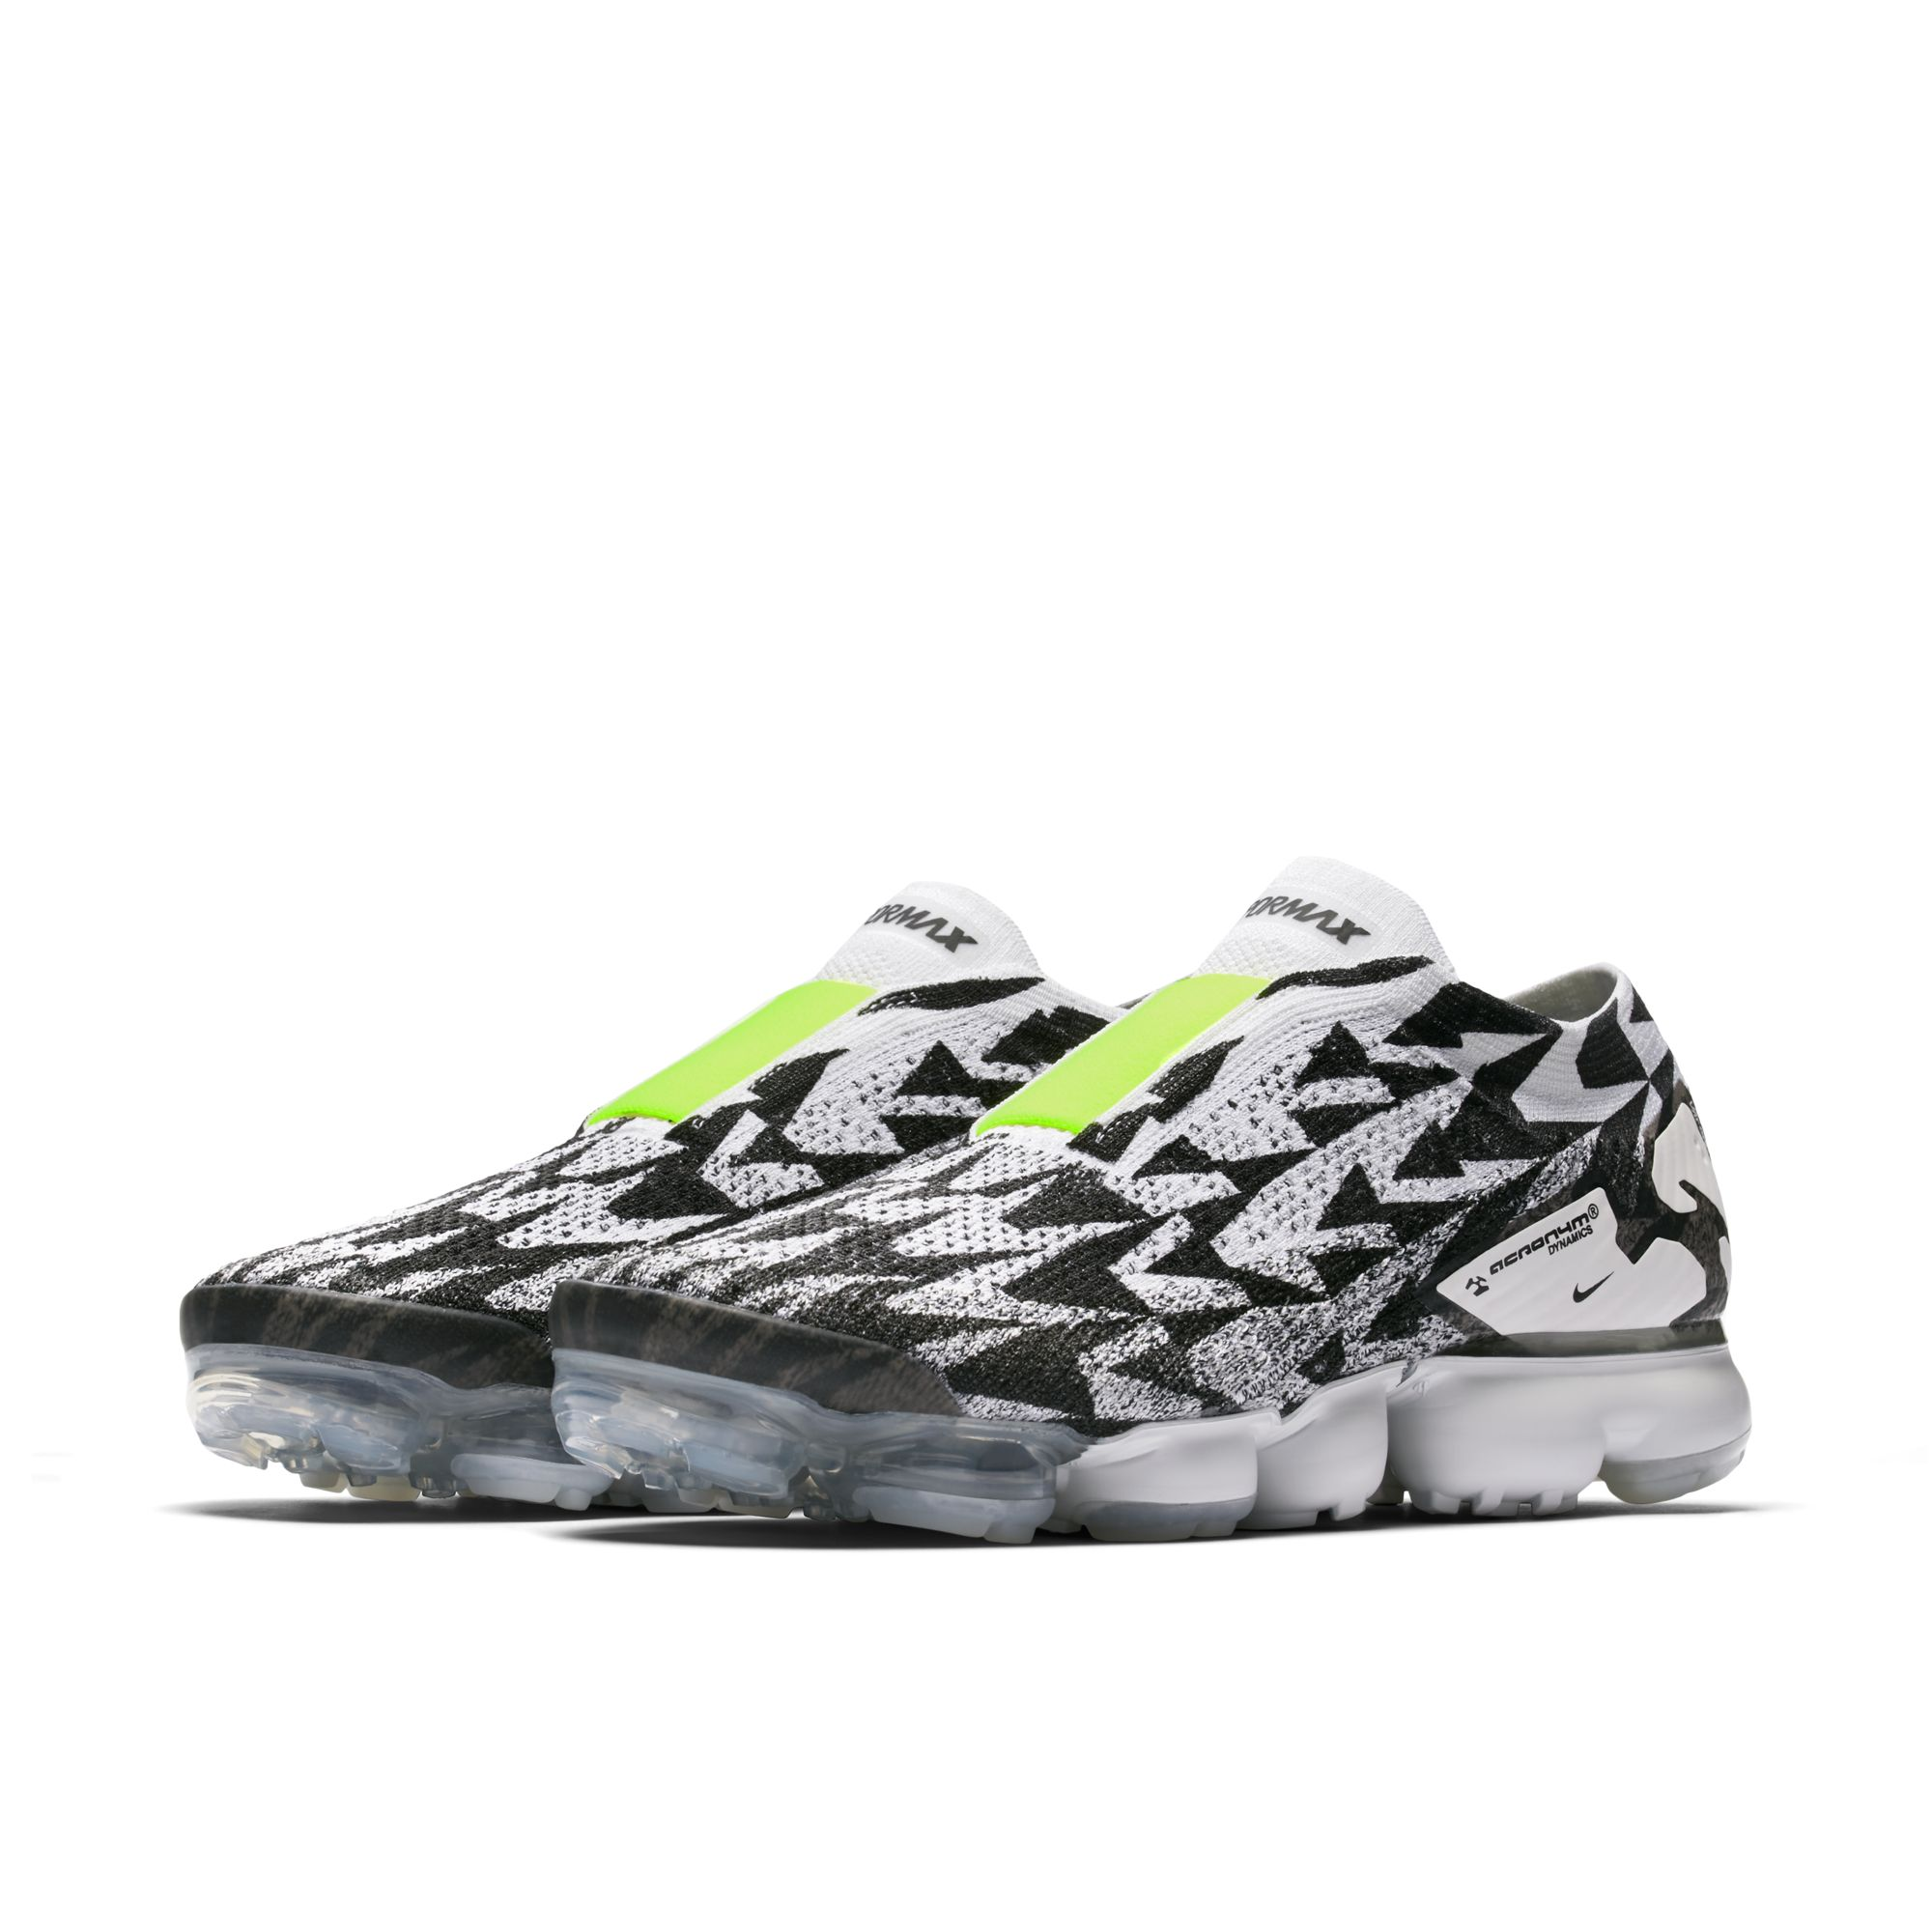 0e211291c5 ACRONYM Nike air Vapormax Moc 2 - WearTesters